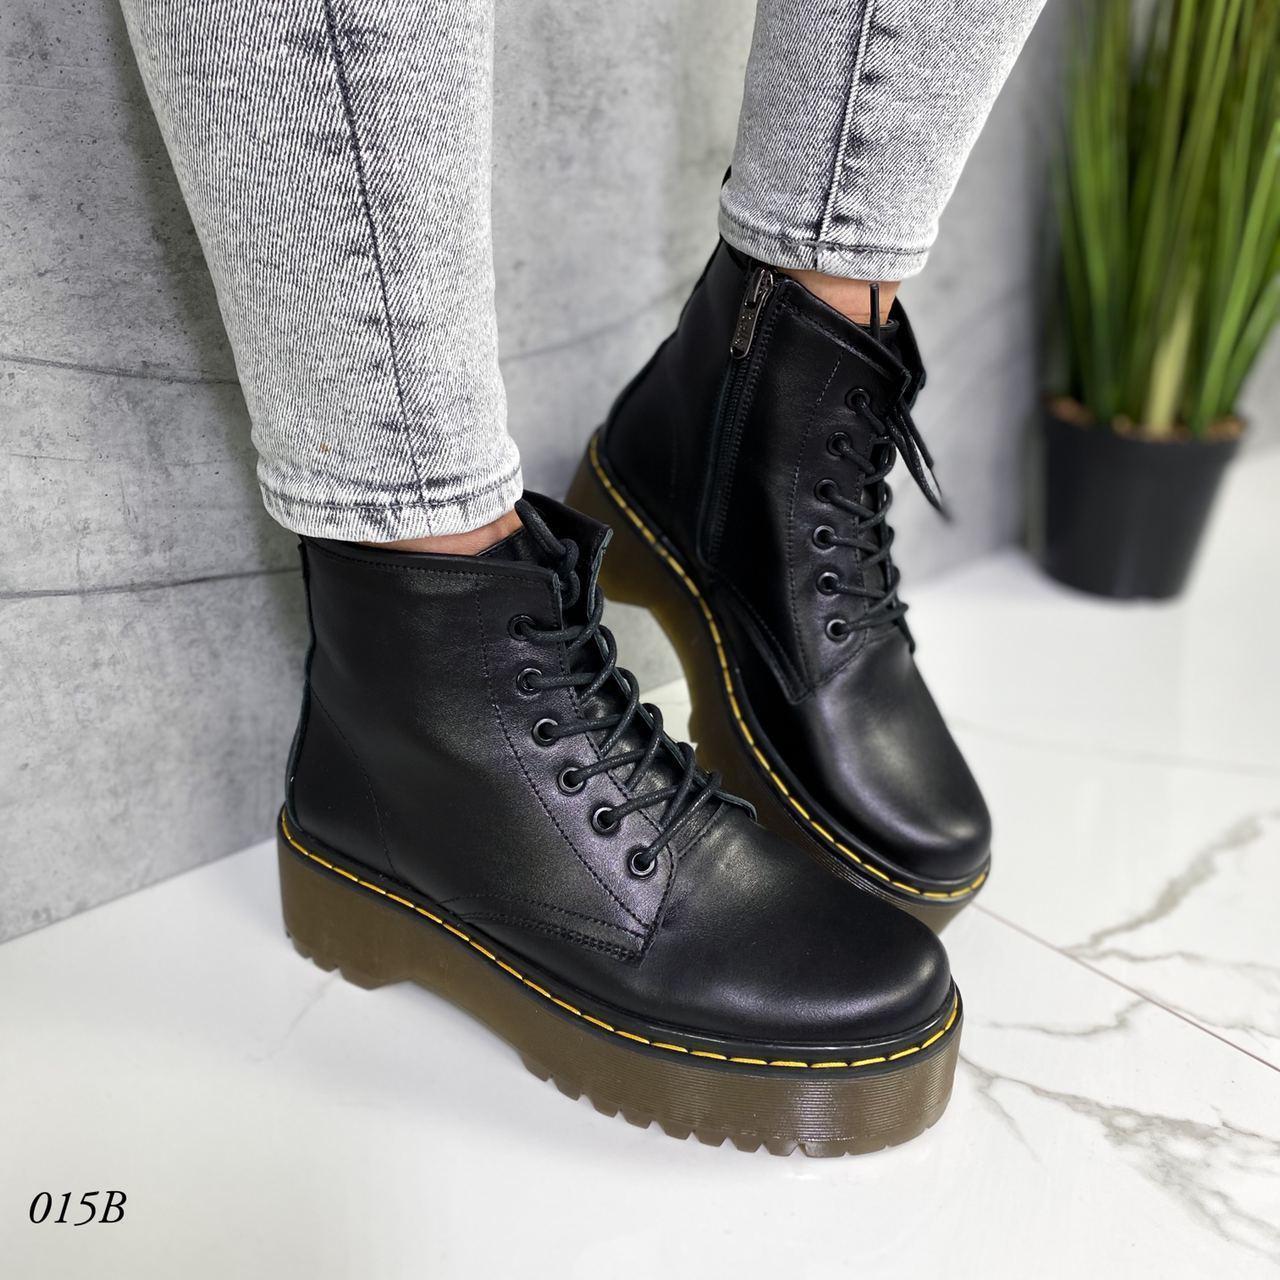 Женские ботинки -Martin- кожаные